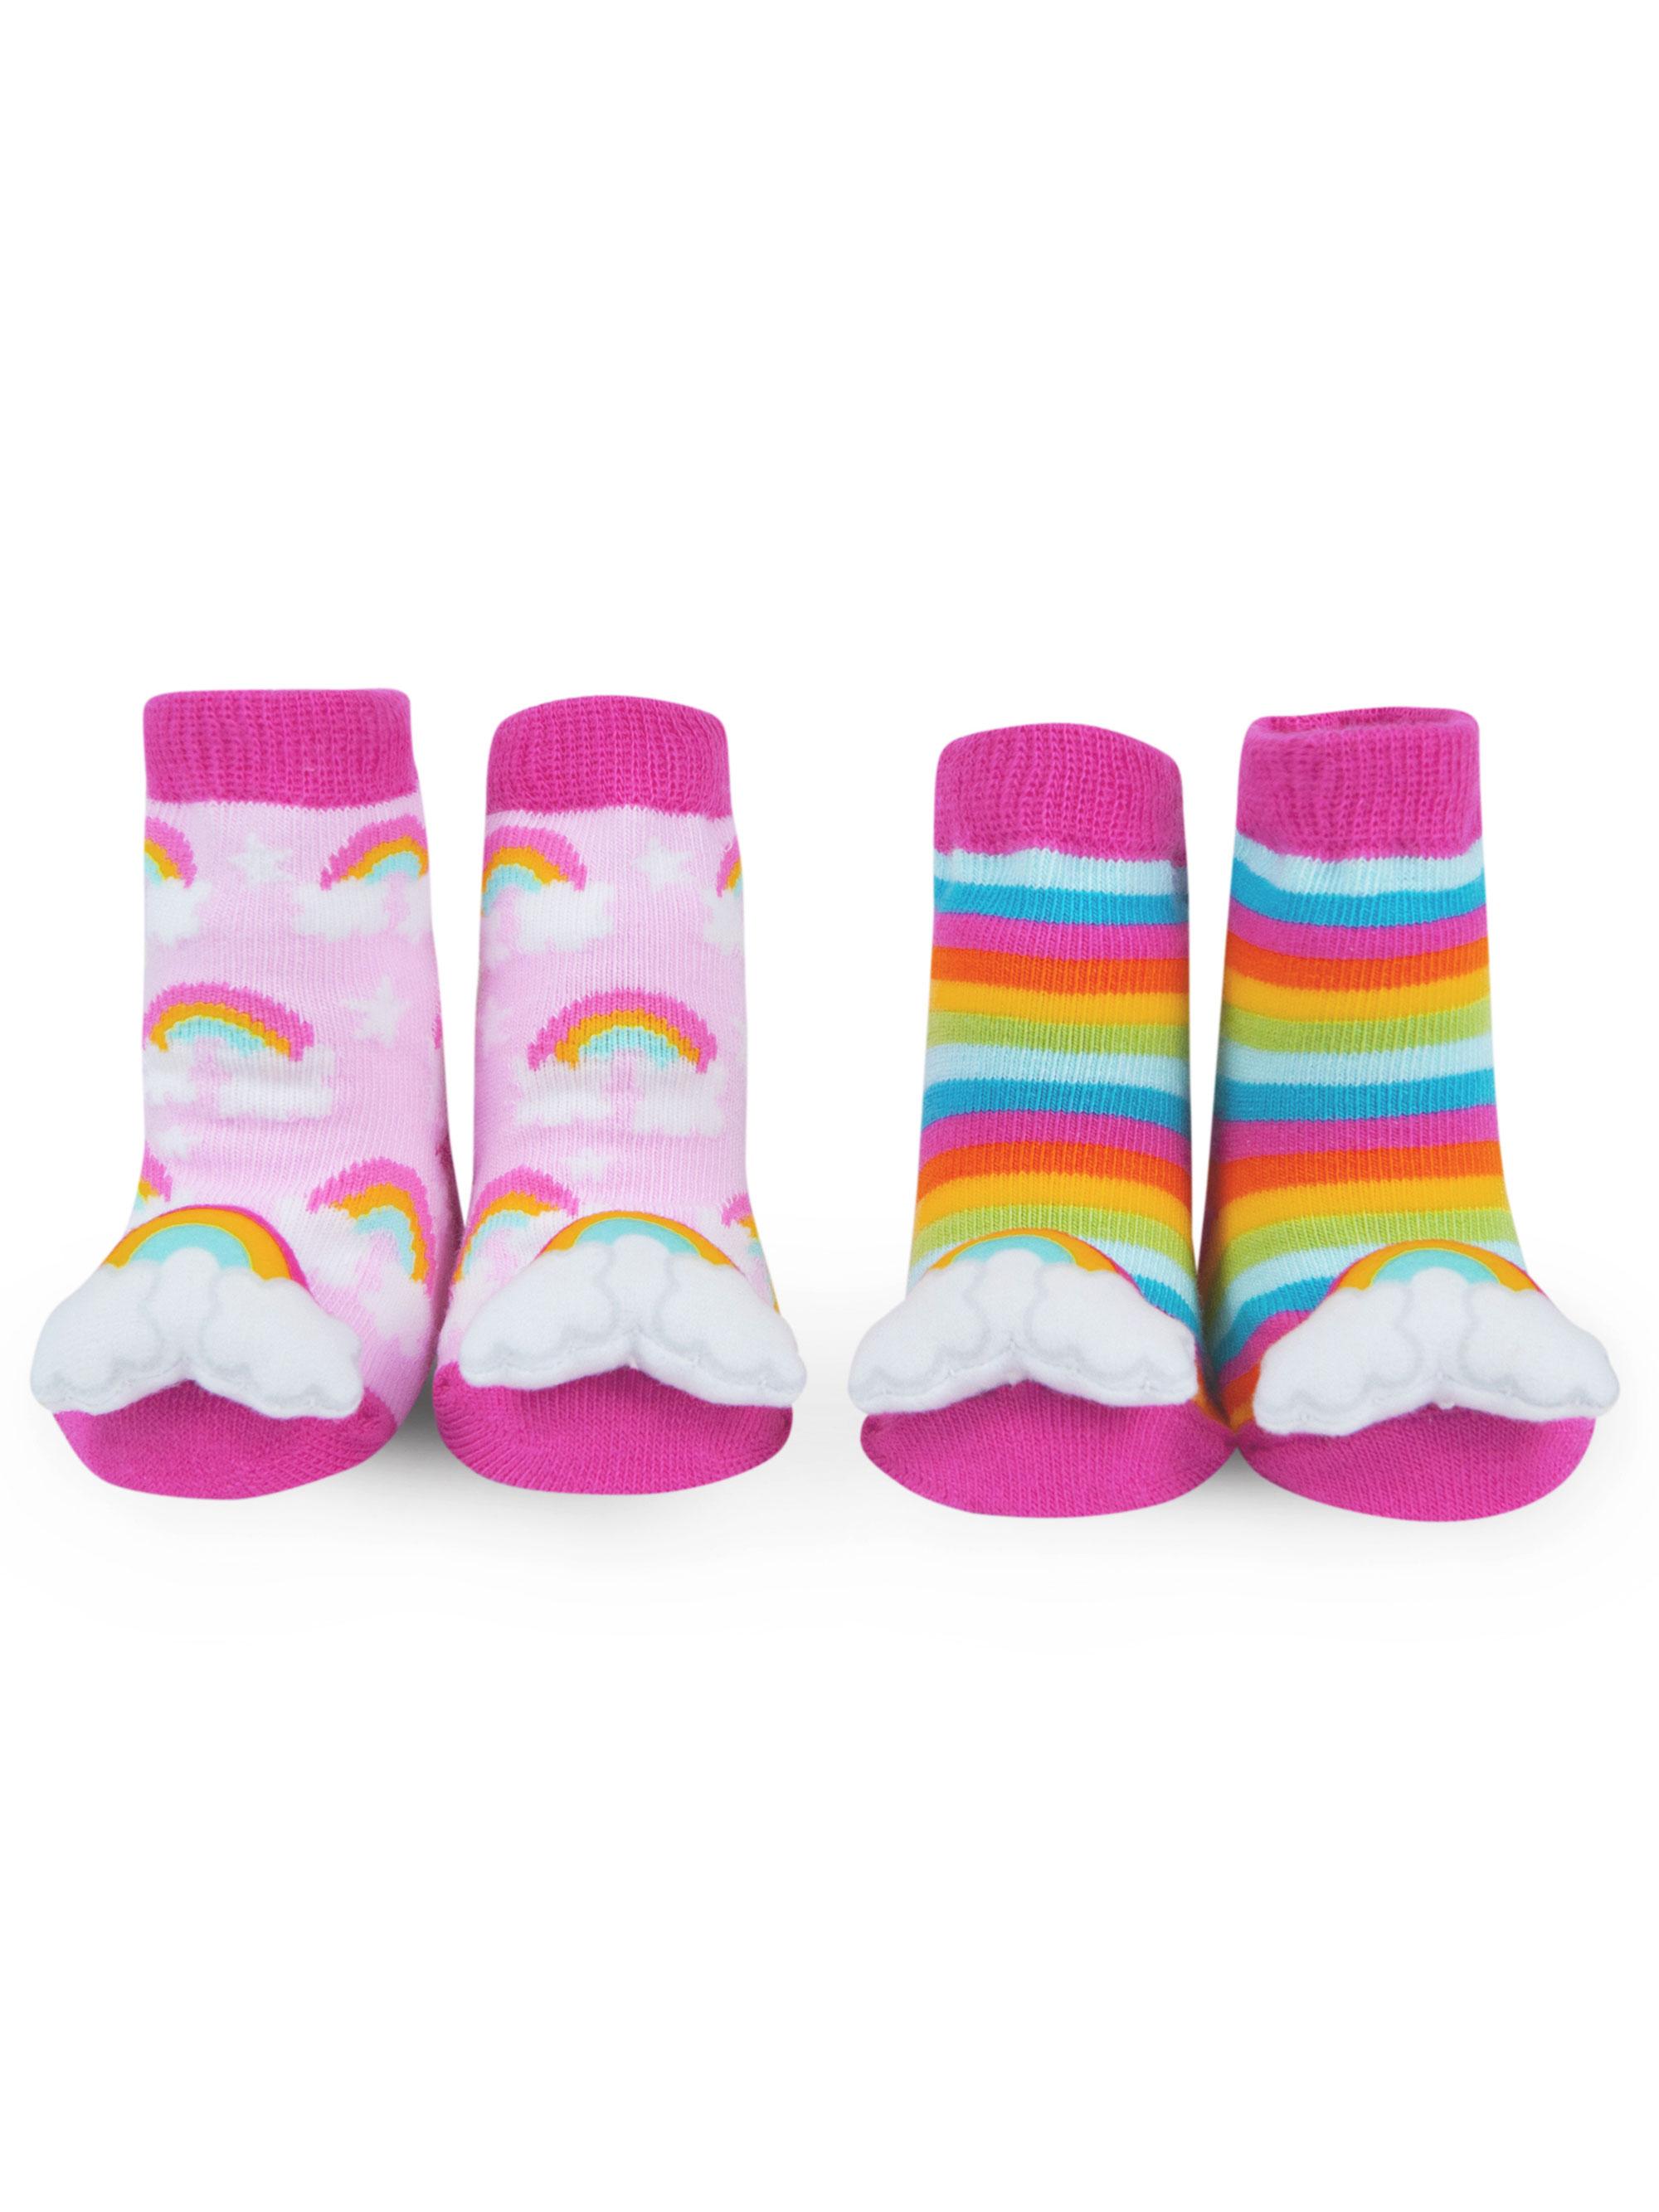 Waddle Girls Rainbow Socks Baby Rattle Newborn 0-12 Months | 2 Pairs Pink